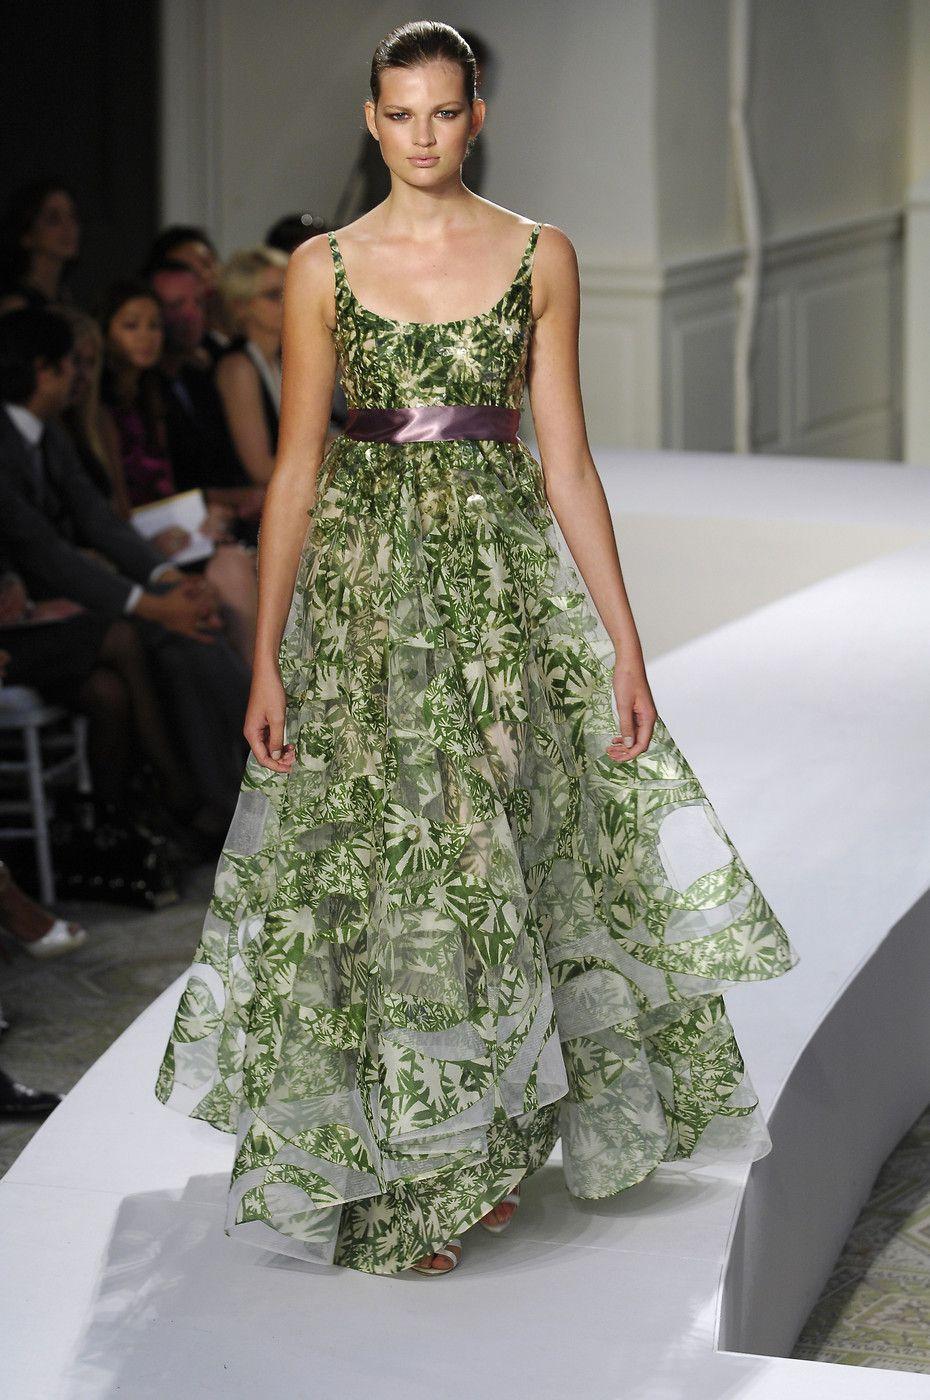 Oscar de la Renta at New York Fashion Week Spring 2008 - StyleBistro